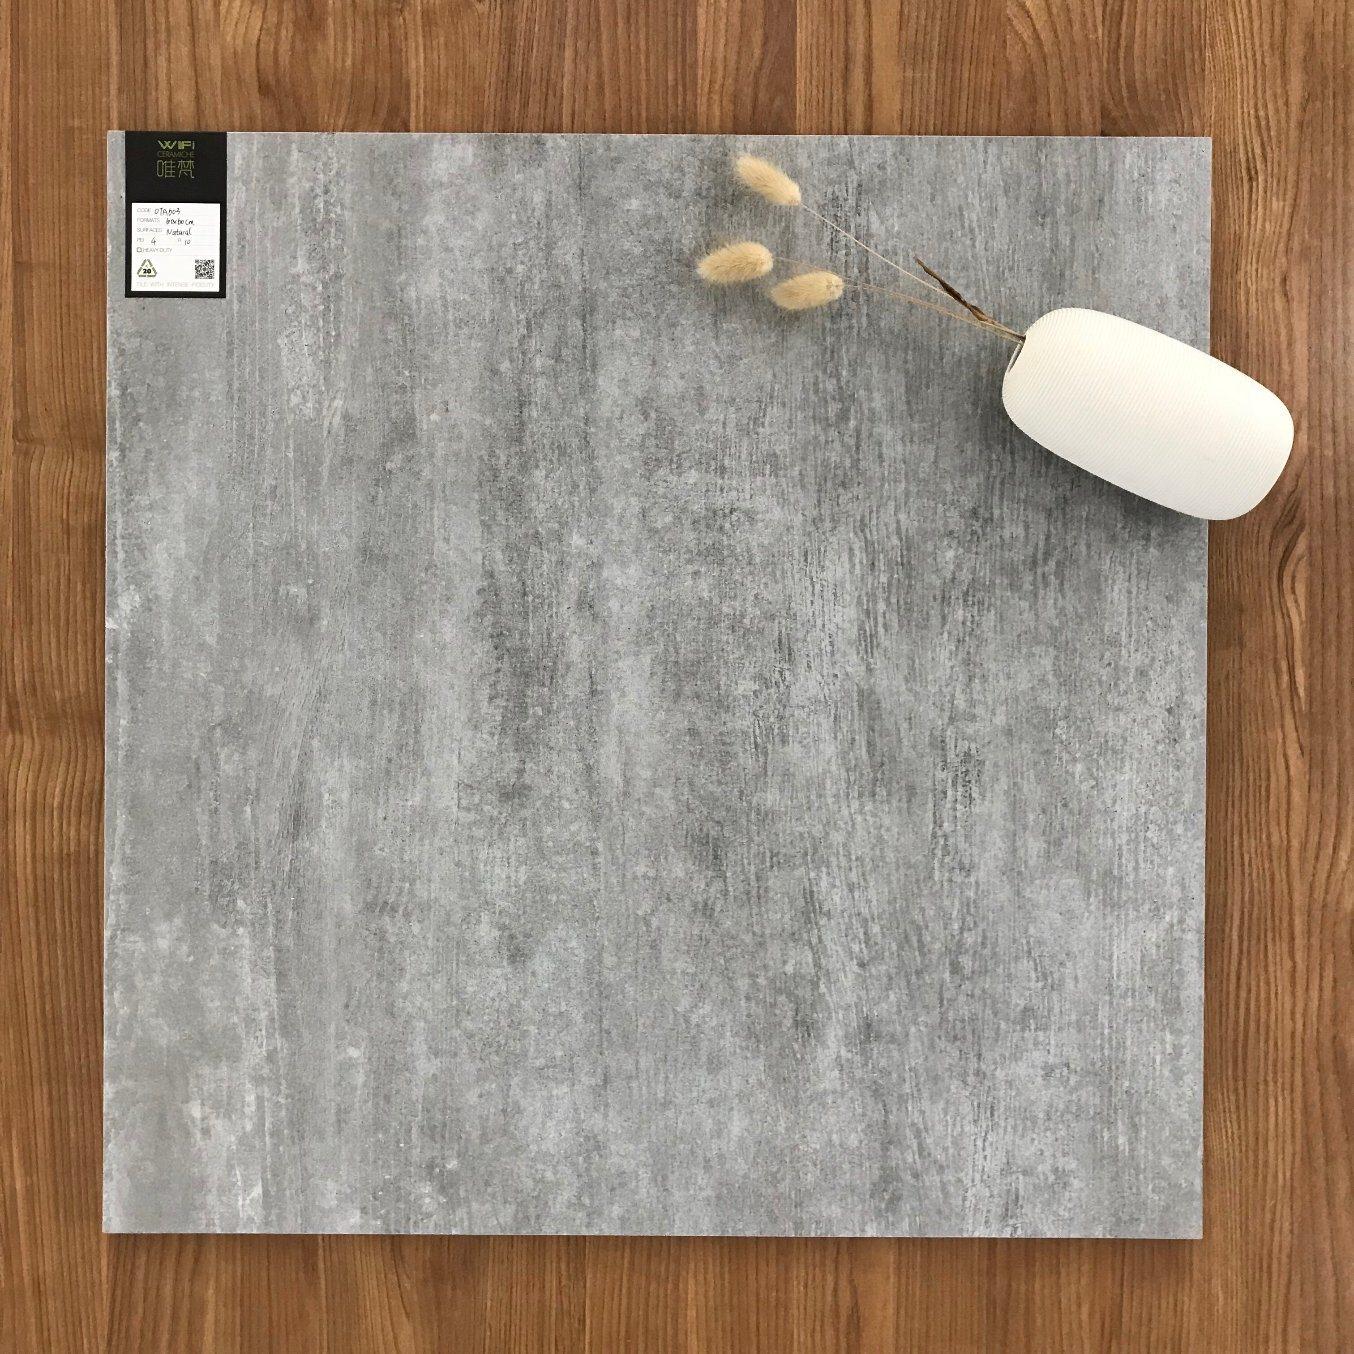 Italian Style Porcelain Tile Decoration Floor And Wall Ota603 Cinder